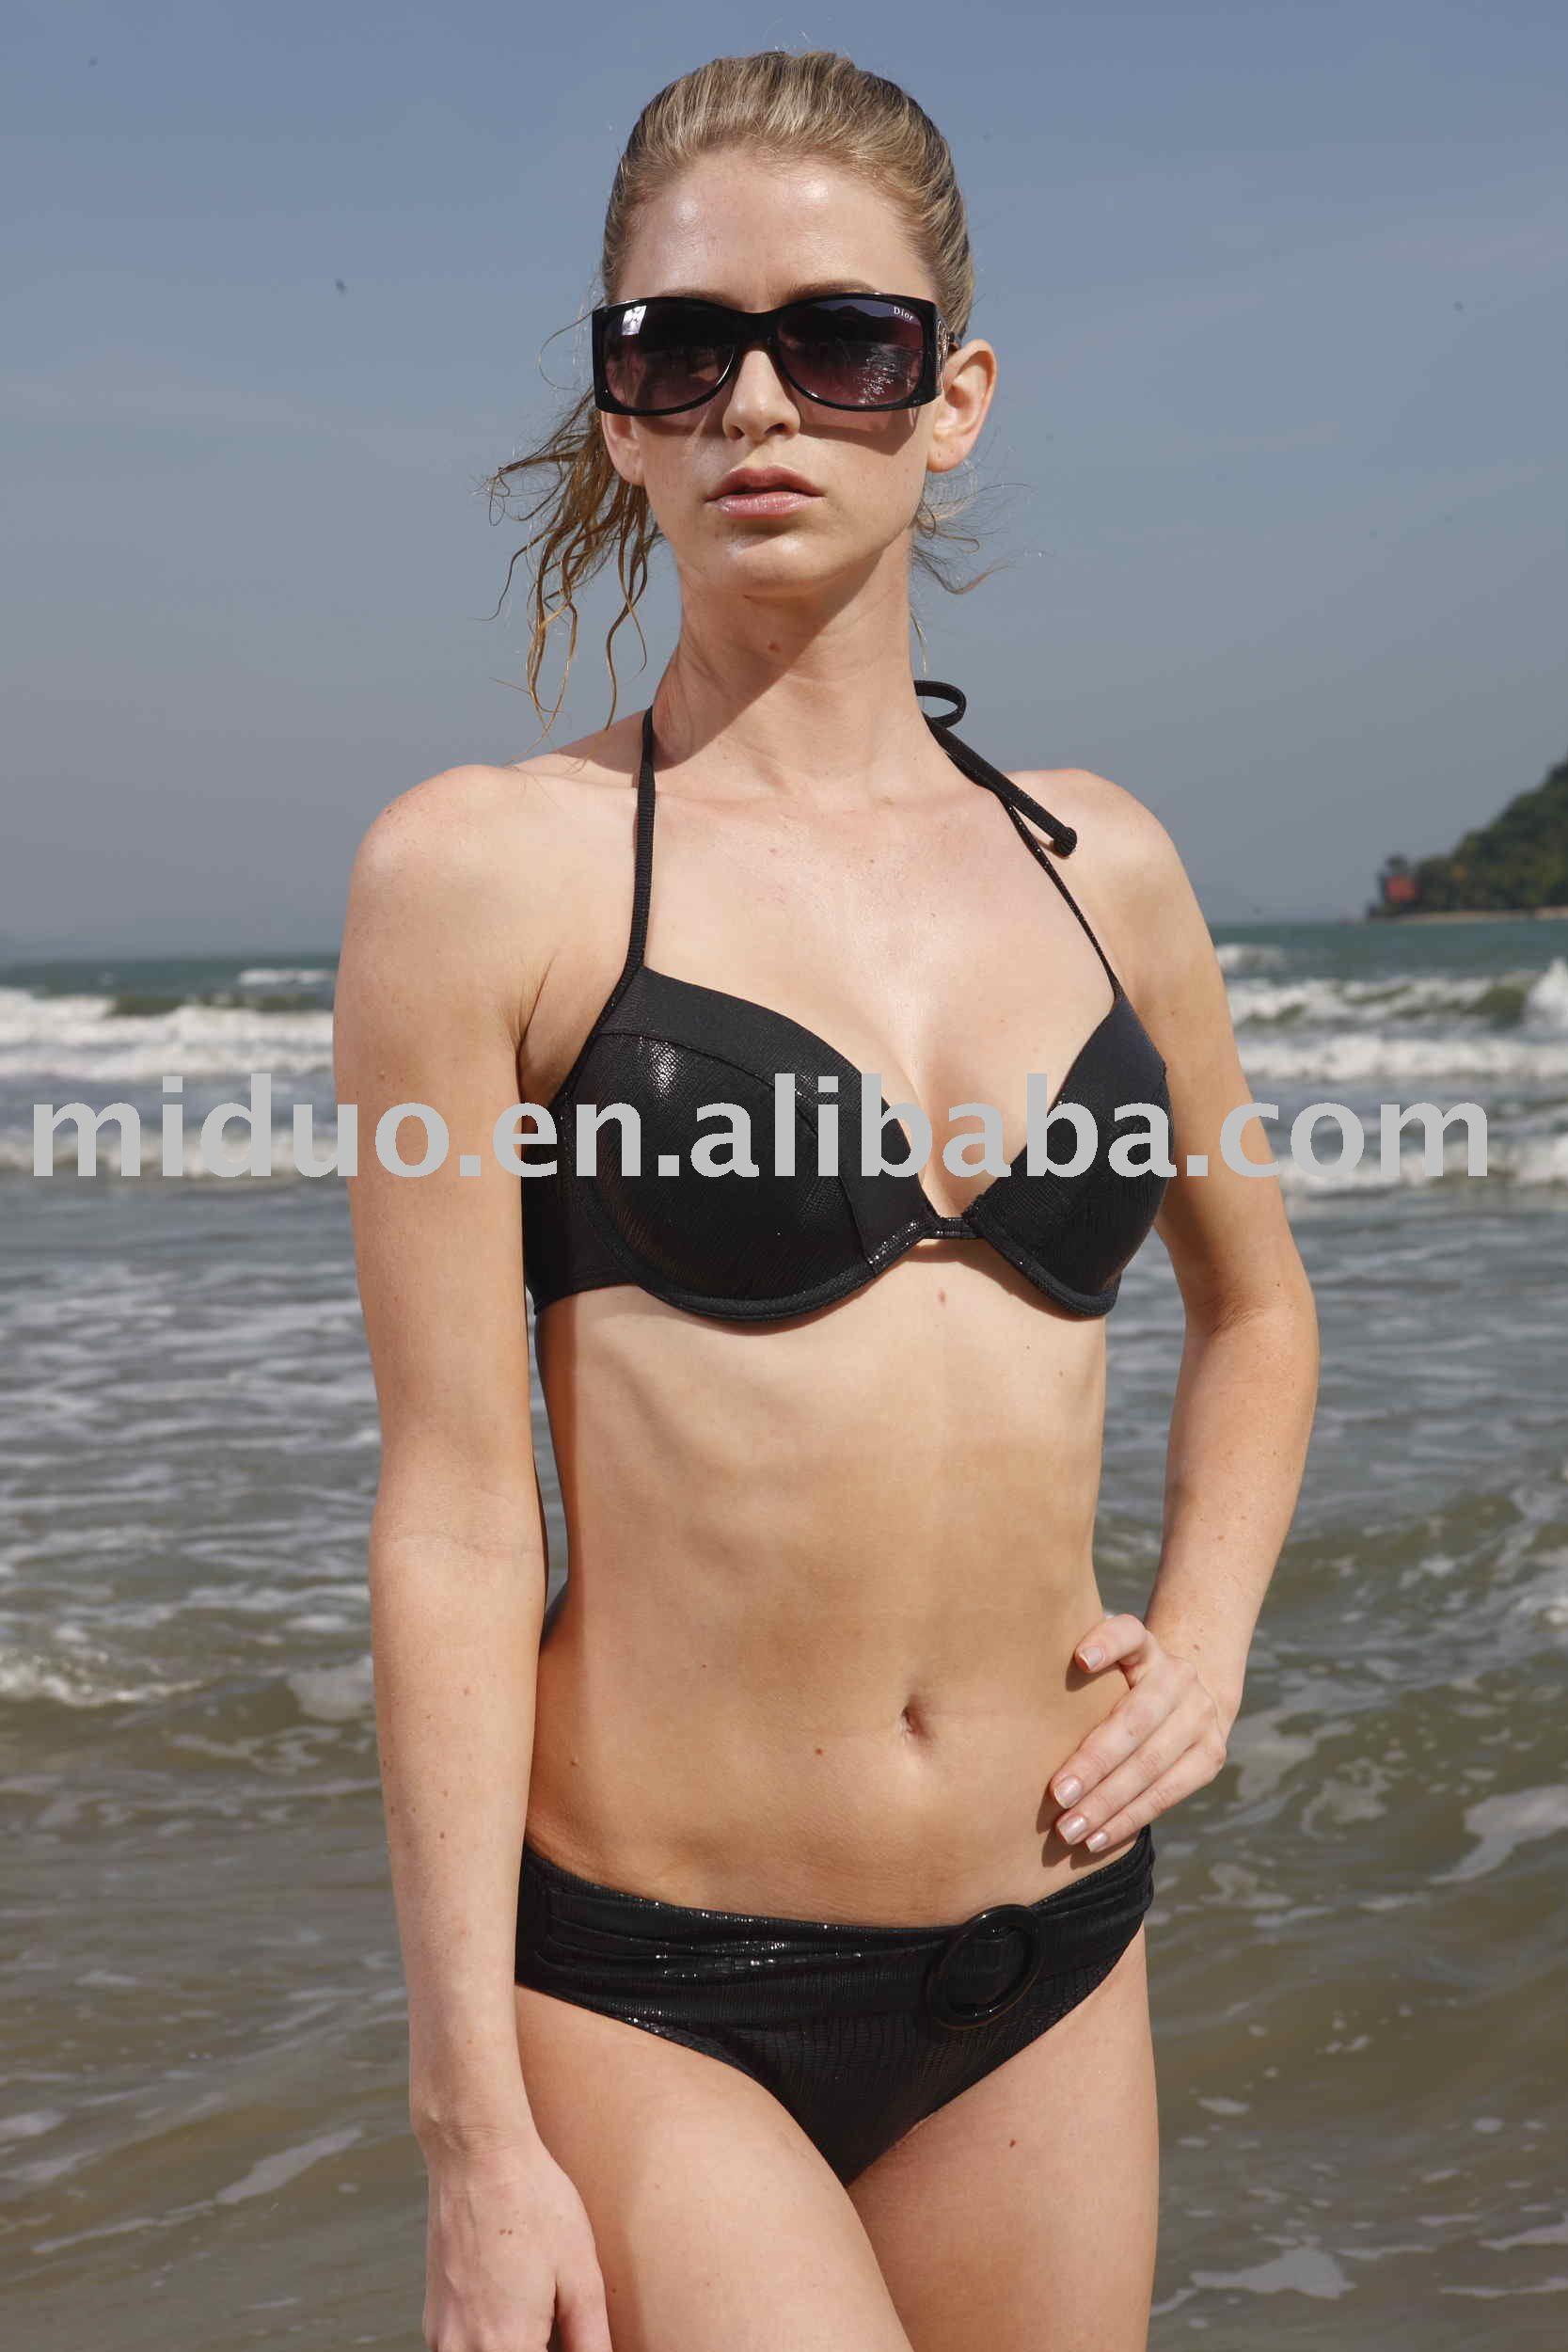 12set/Lot Ladies Sexy Swimwear Beachwear Bikini. US$ 111.34 - US$ 136.08/lot